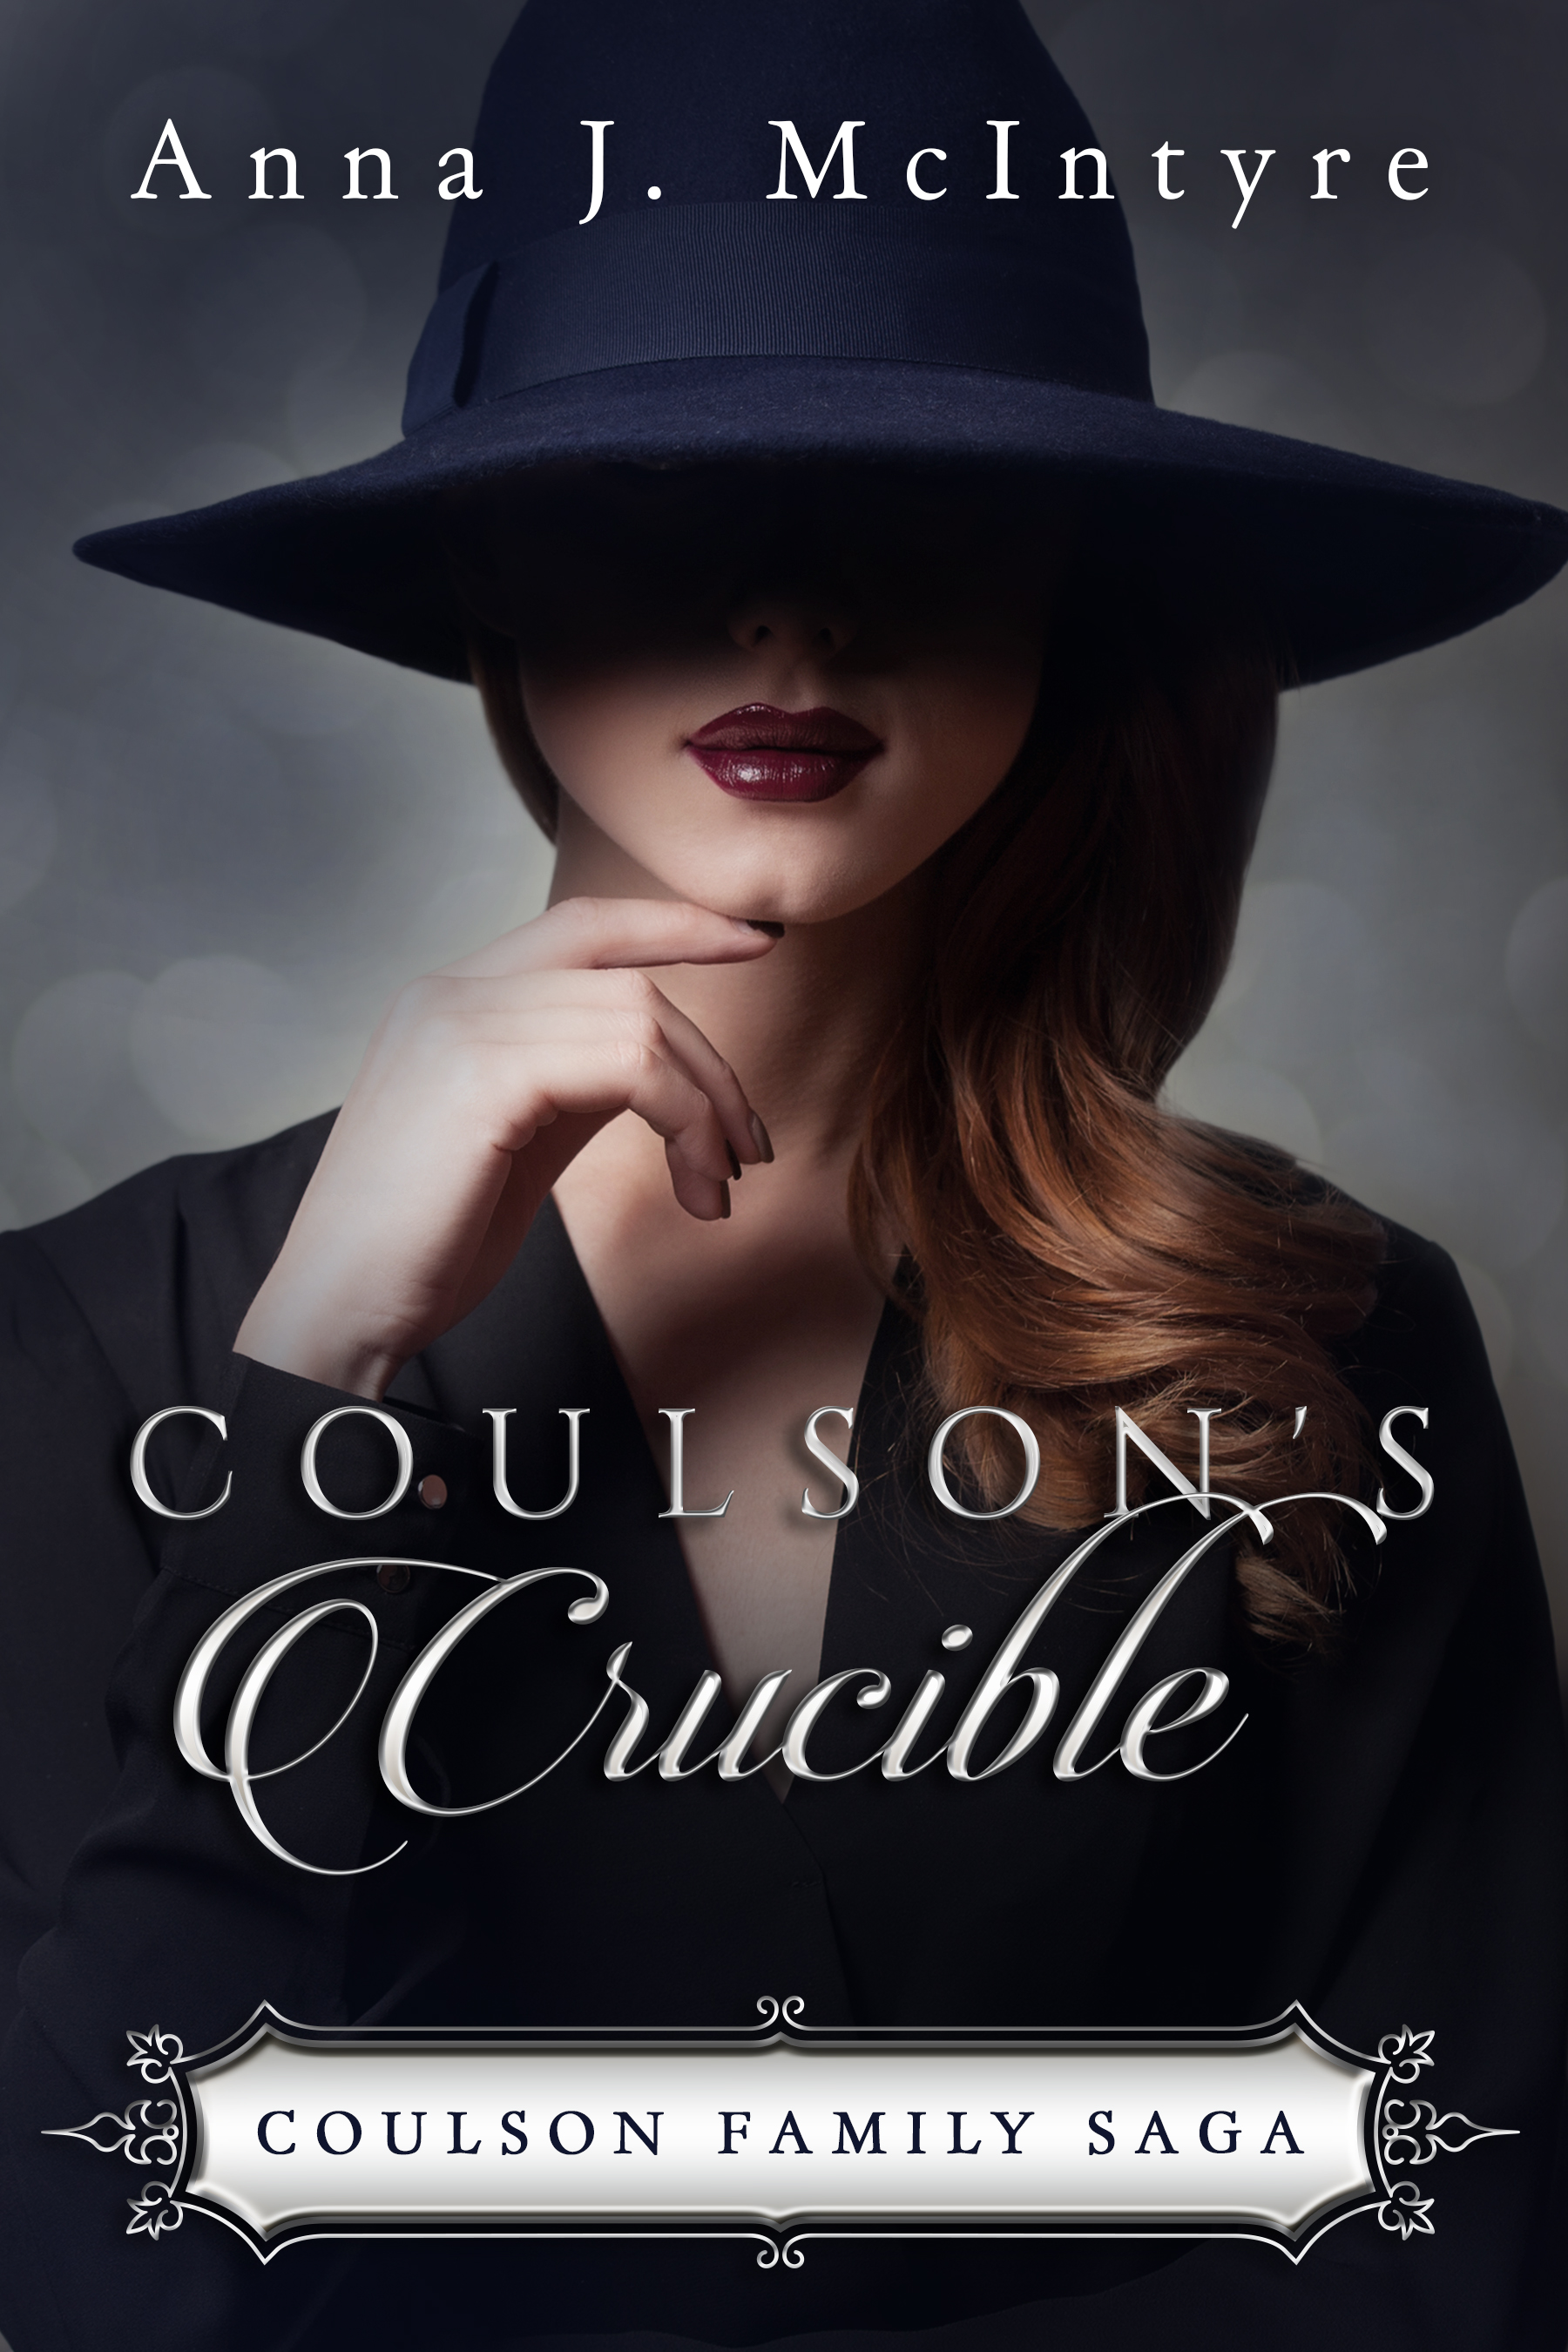 Coulson's Crucible